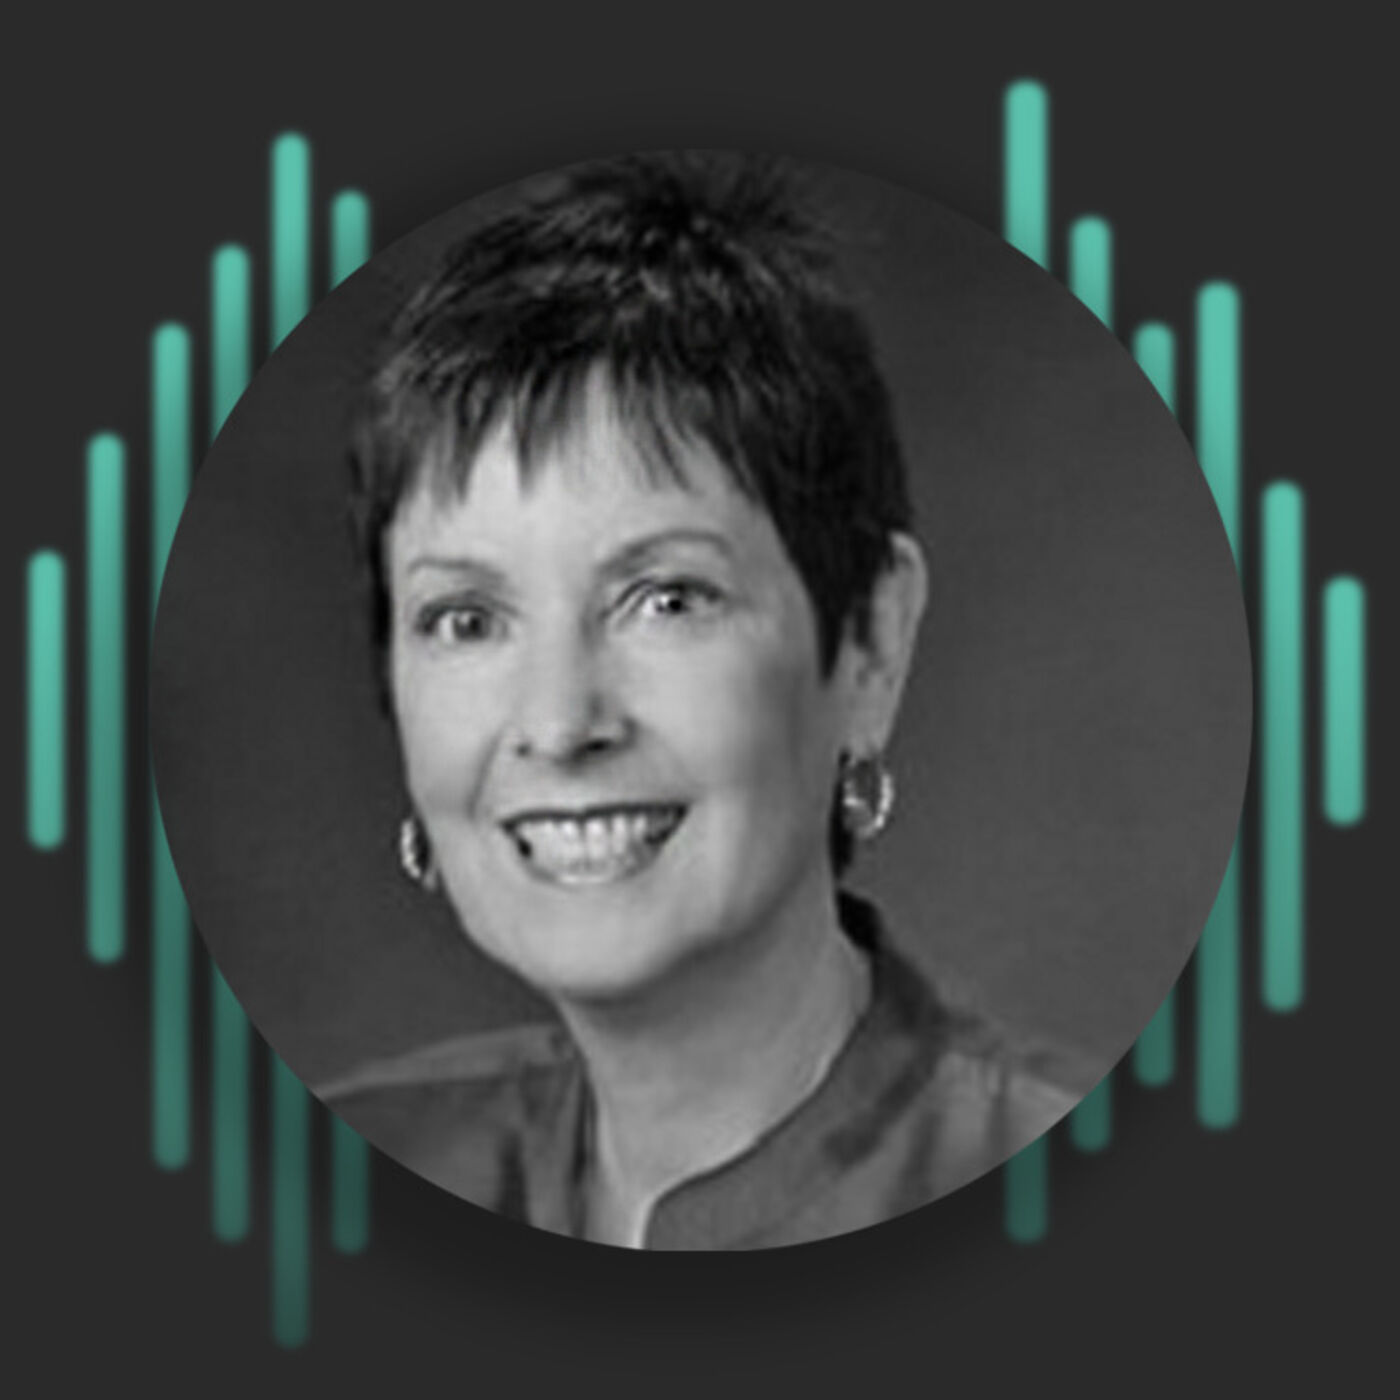 Episode 15: Karen J. Nichols D.O. Chair of the ACGME